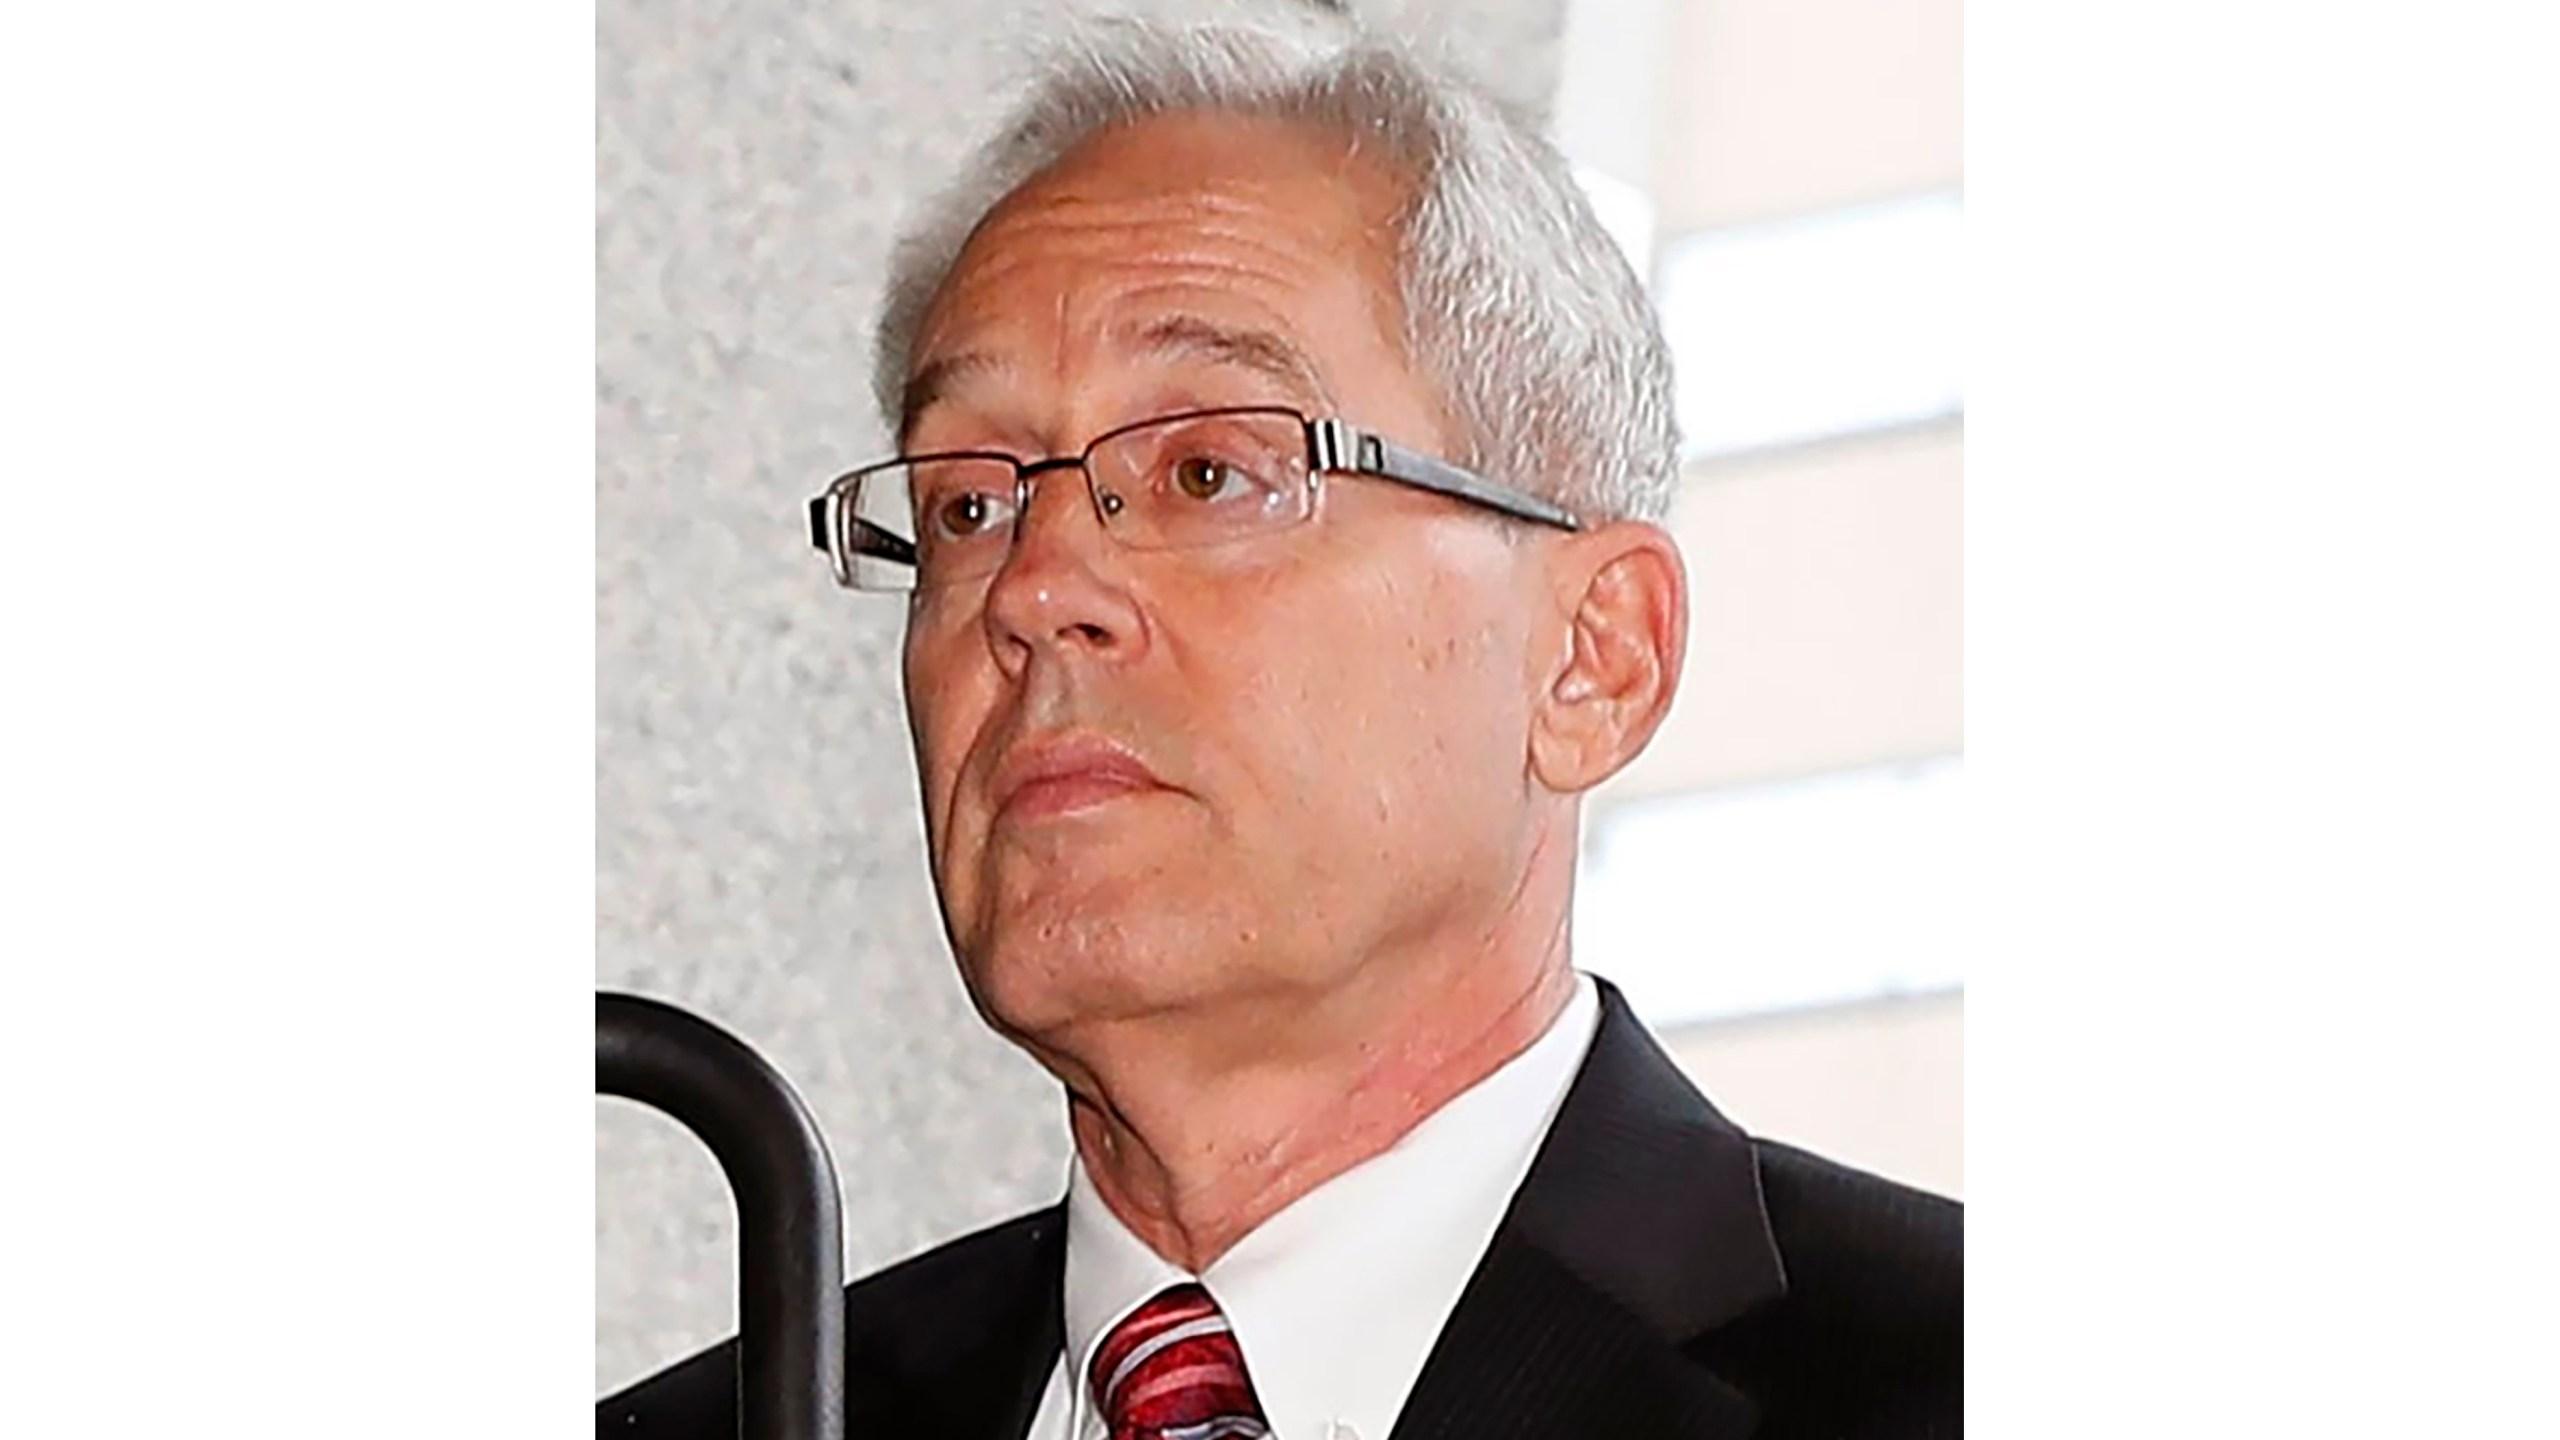 Greg Kelly